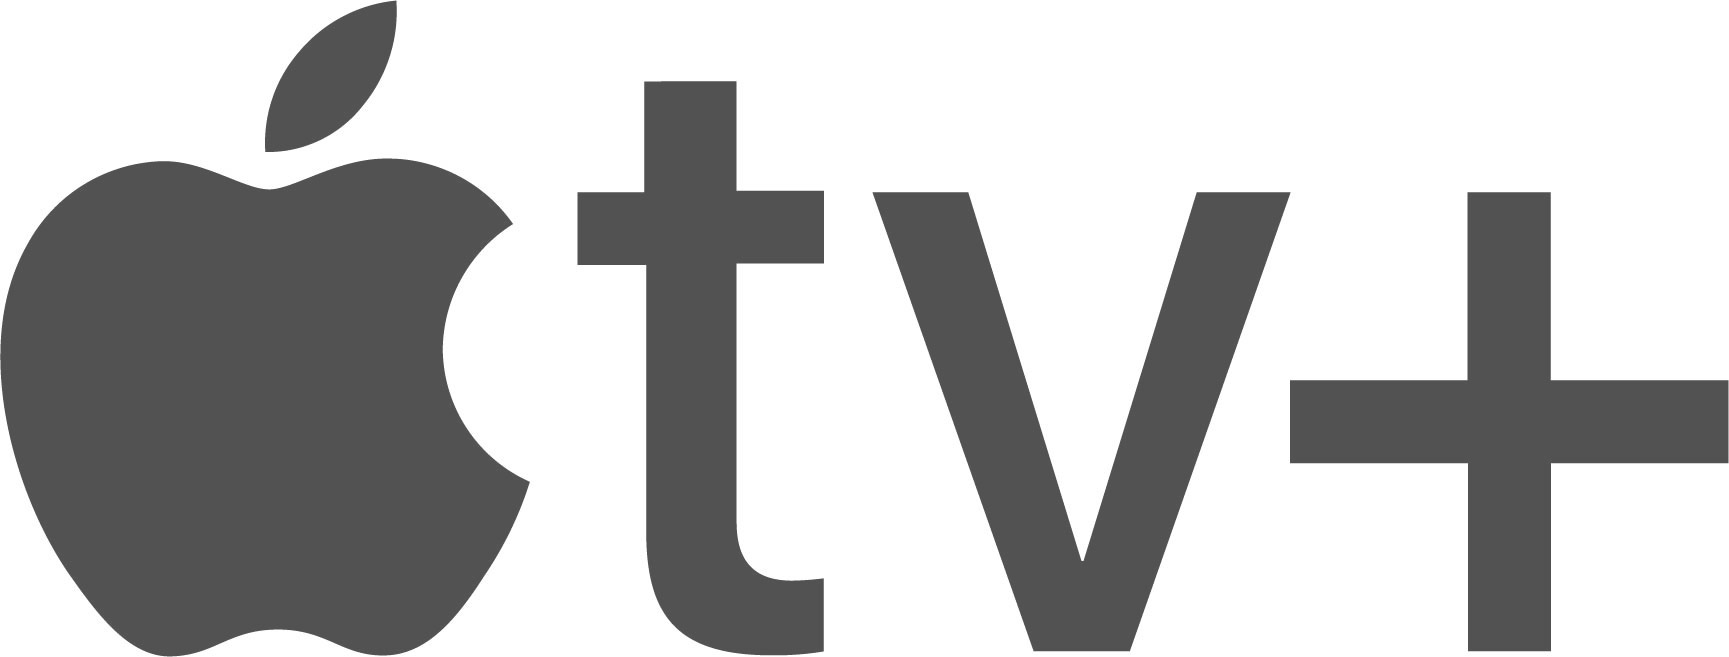 Apple_TV_Plus_Logo_edited